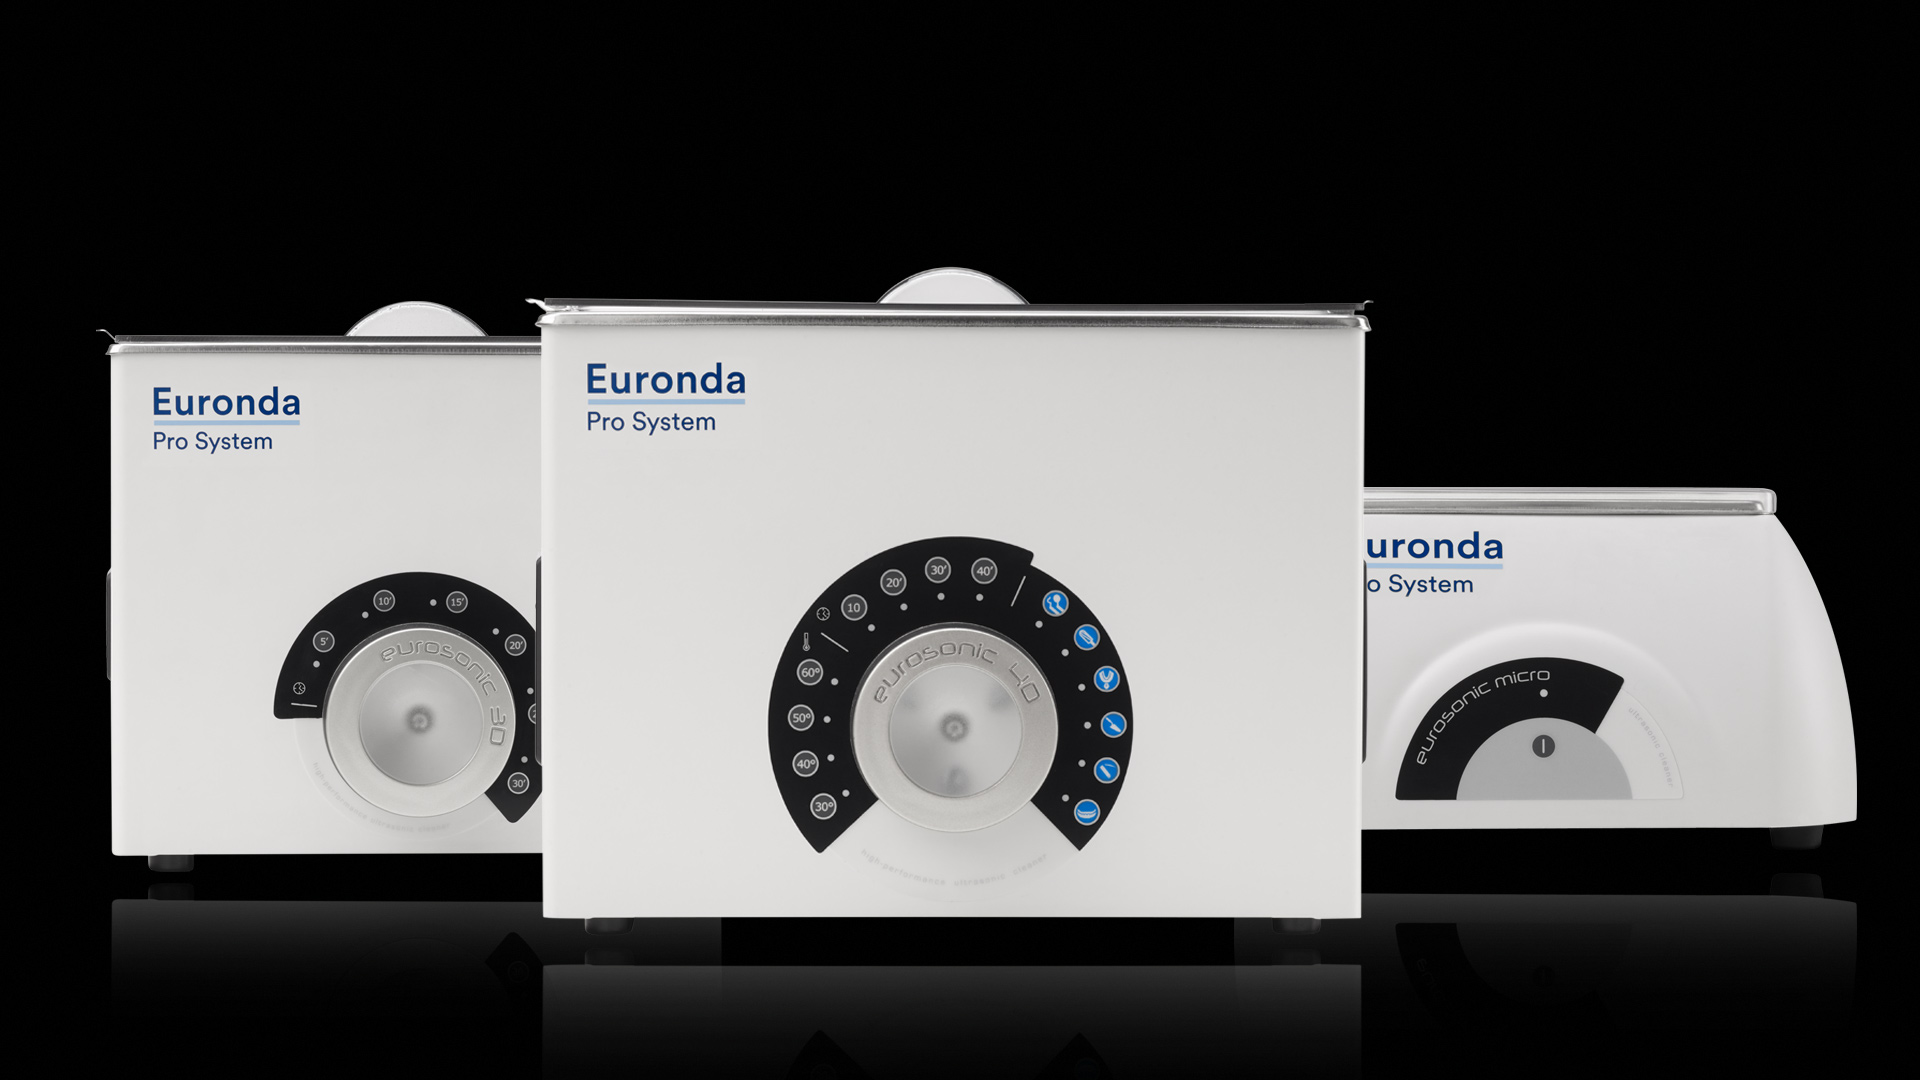 vasche a ultrasuoni euronda - ultrasonic tanks